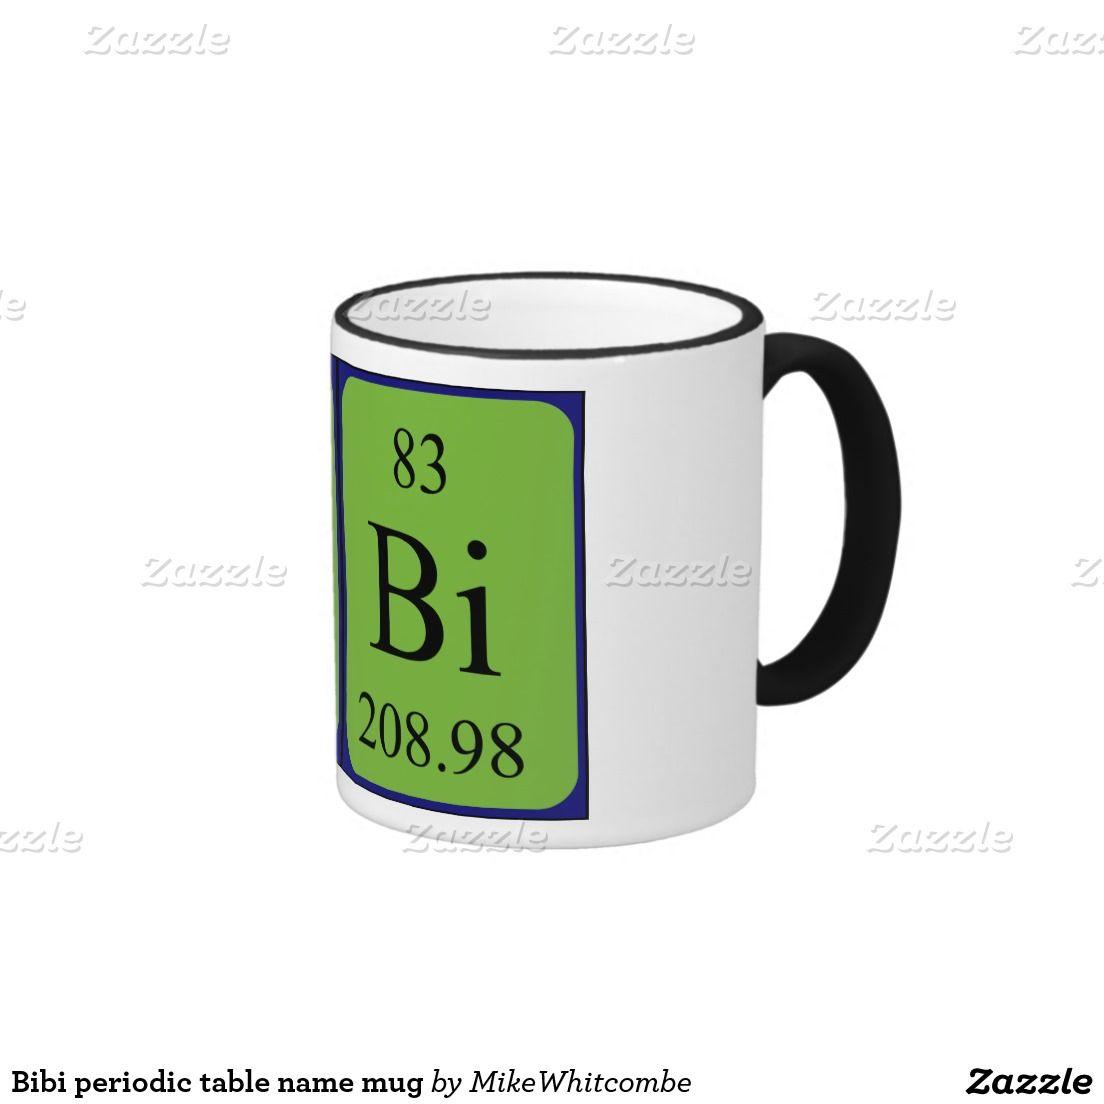 Bibi periodic table name mug november 2015 sales from my zazzle bibi periodic table name mug urtaz Image collections